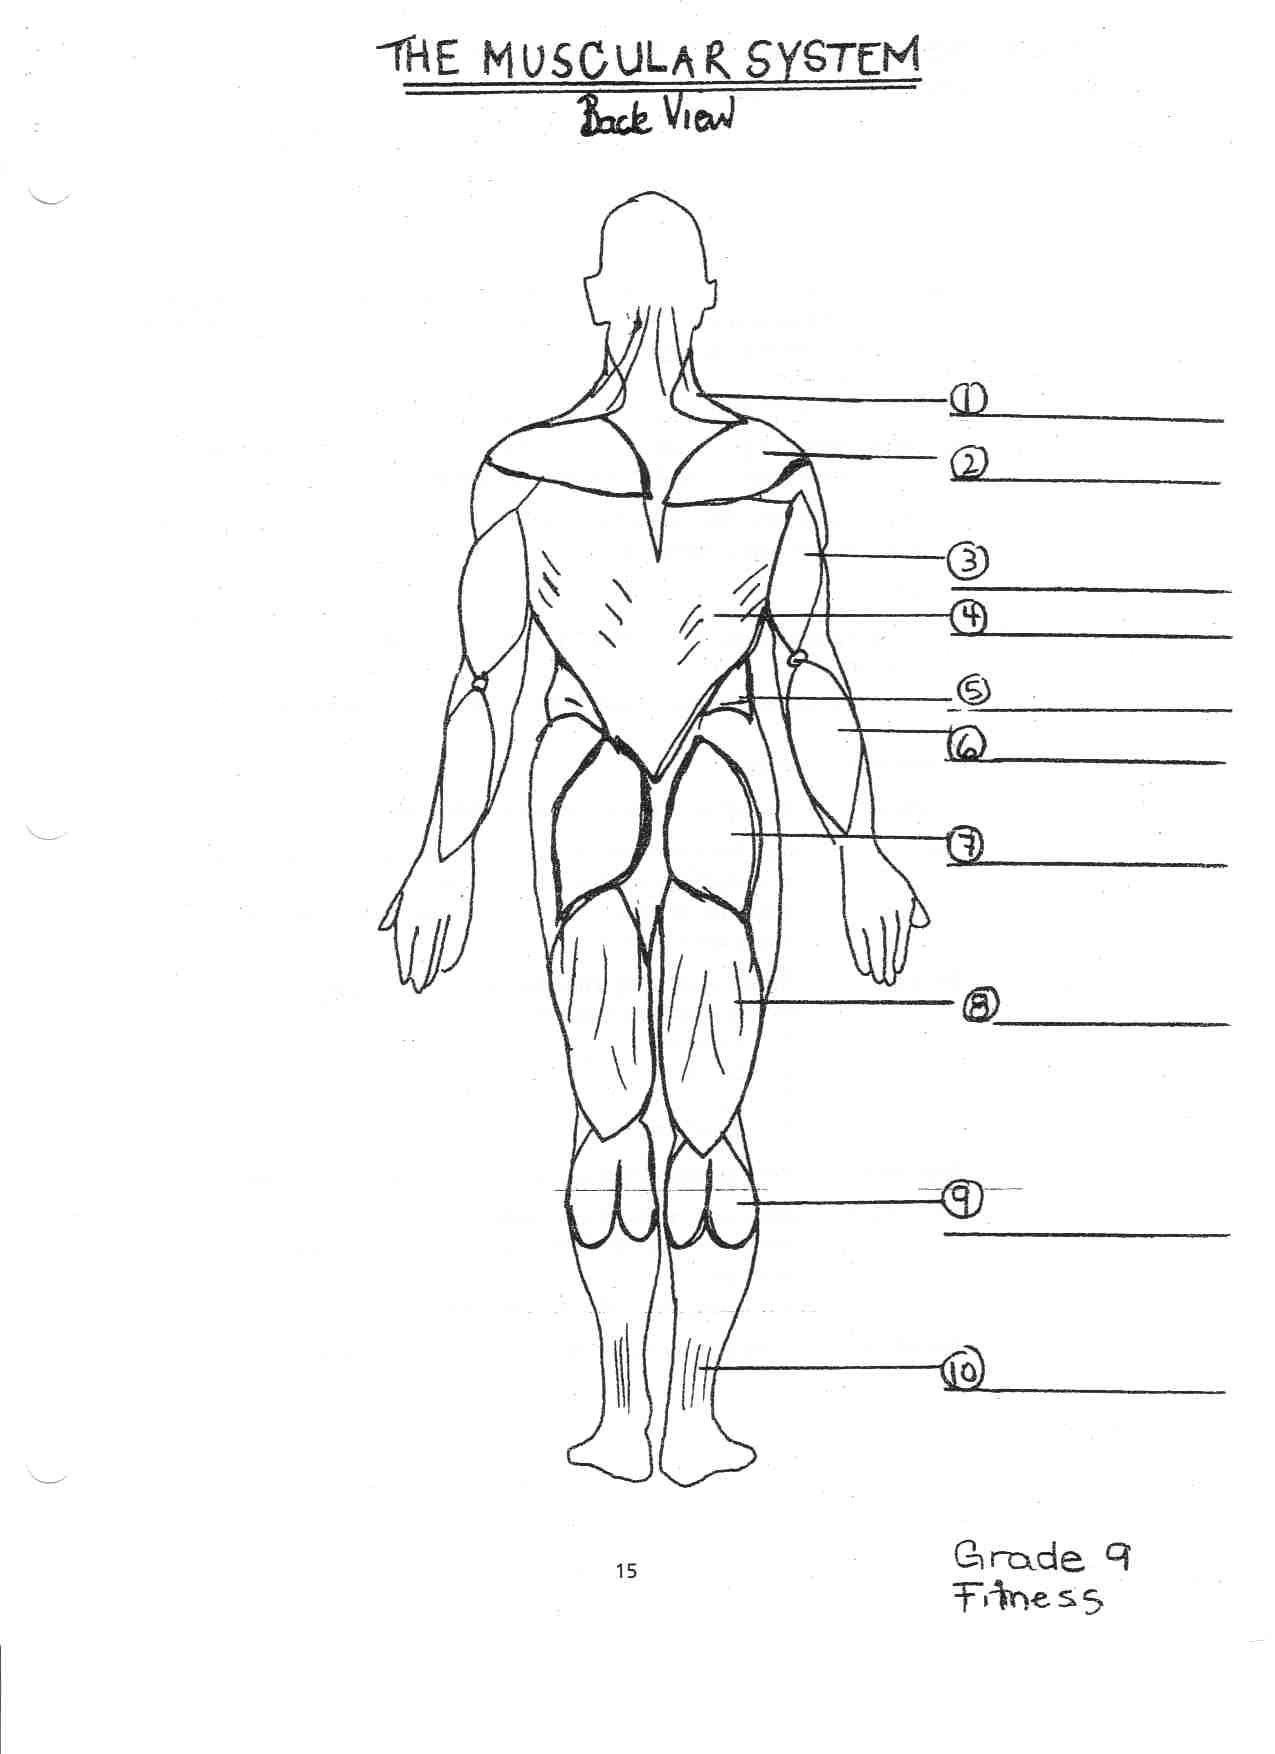 medium resolution of unlabeled muscular system diagram unlabeled muscular system diagram 40 fresh human anatomy muscular system body